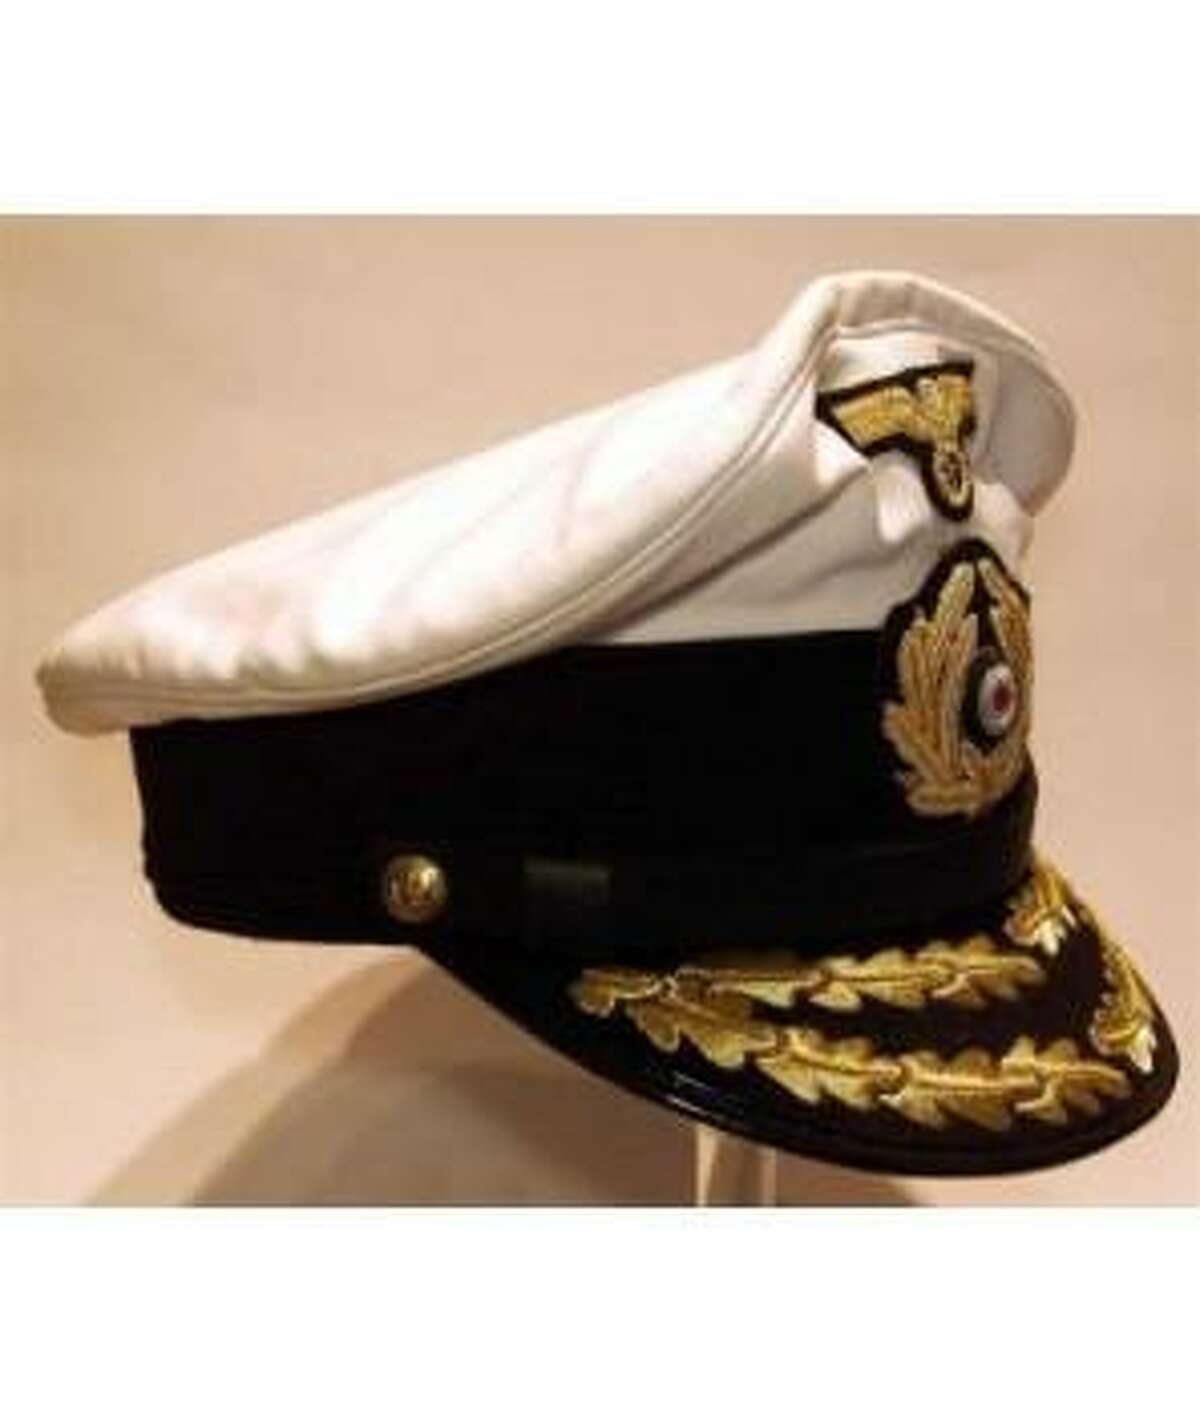 Nazi naval cap